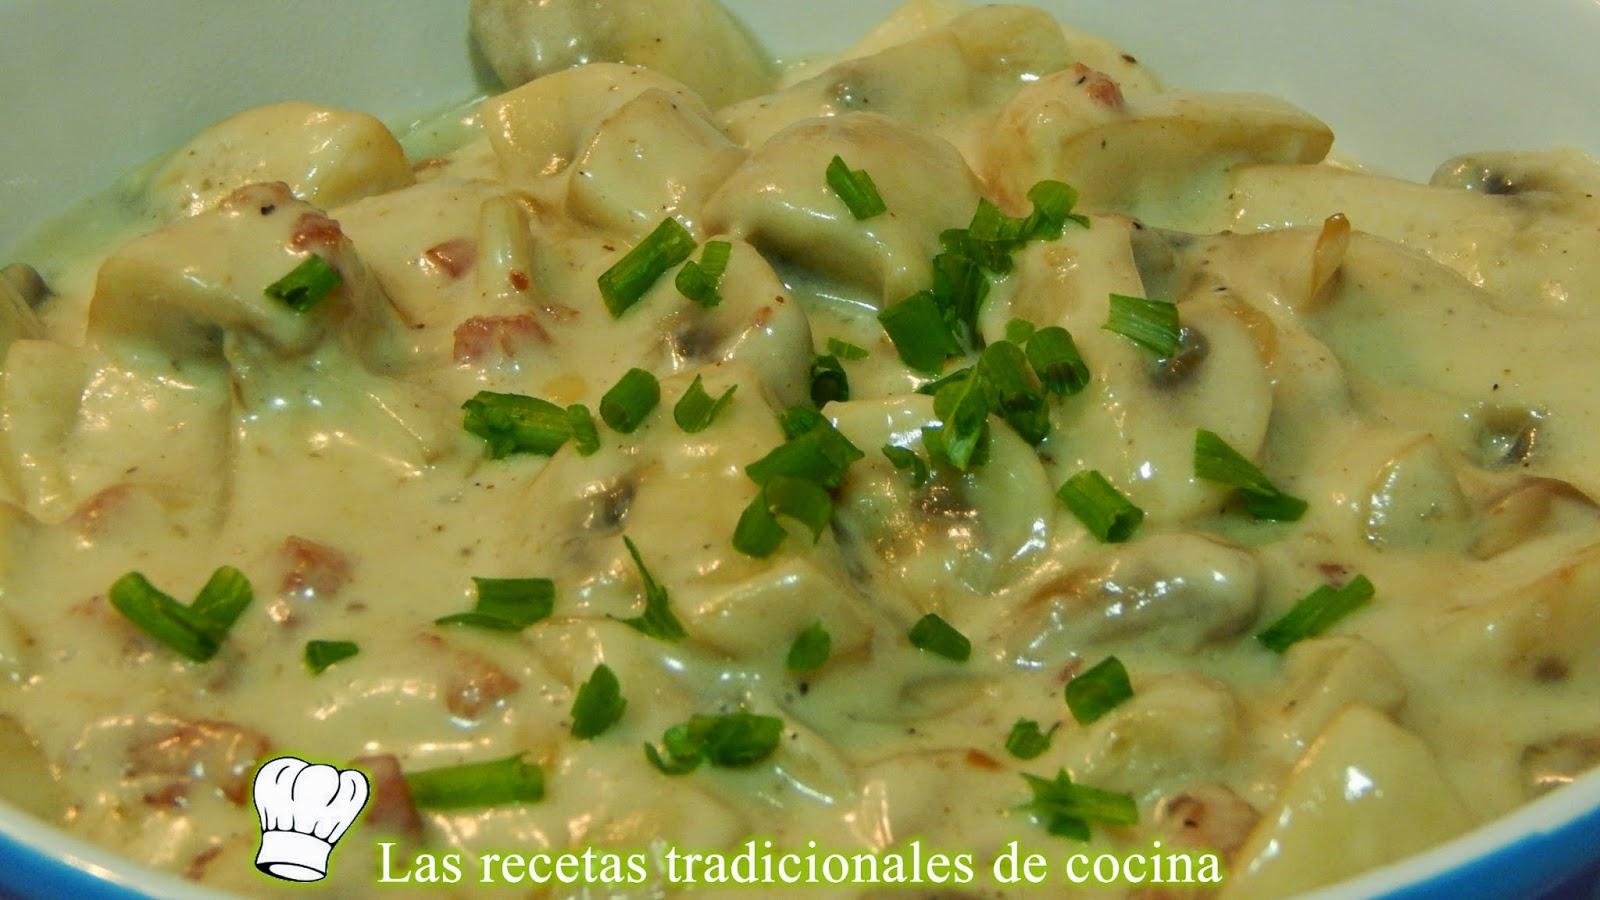 Recetas De Cocina Con Champiñones | Receta Facil De Champinones A La Crema Recetas De Cocina Con